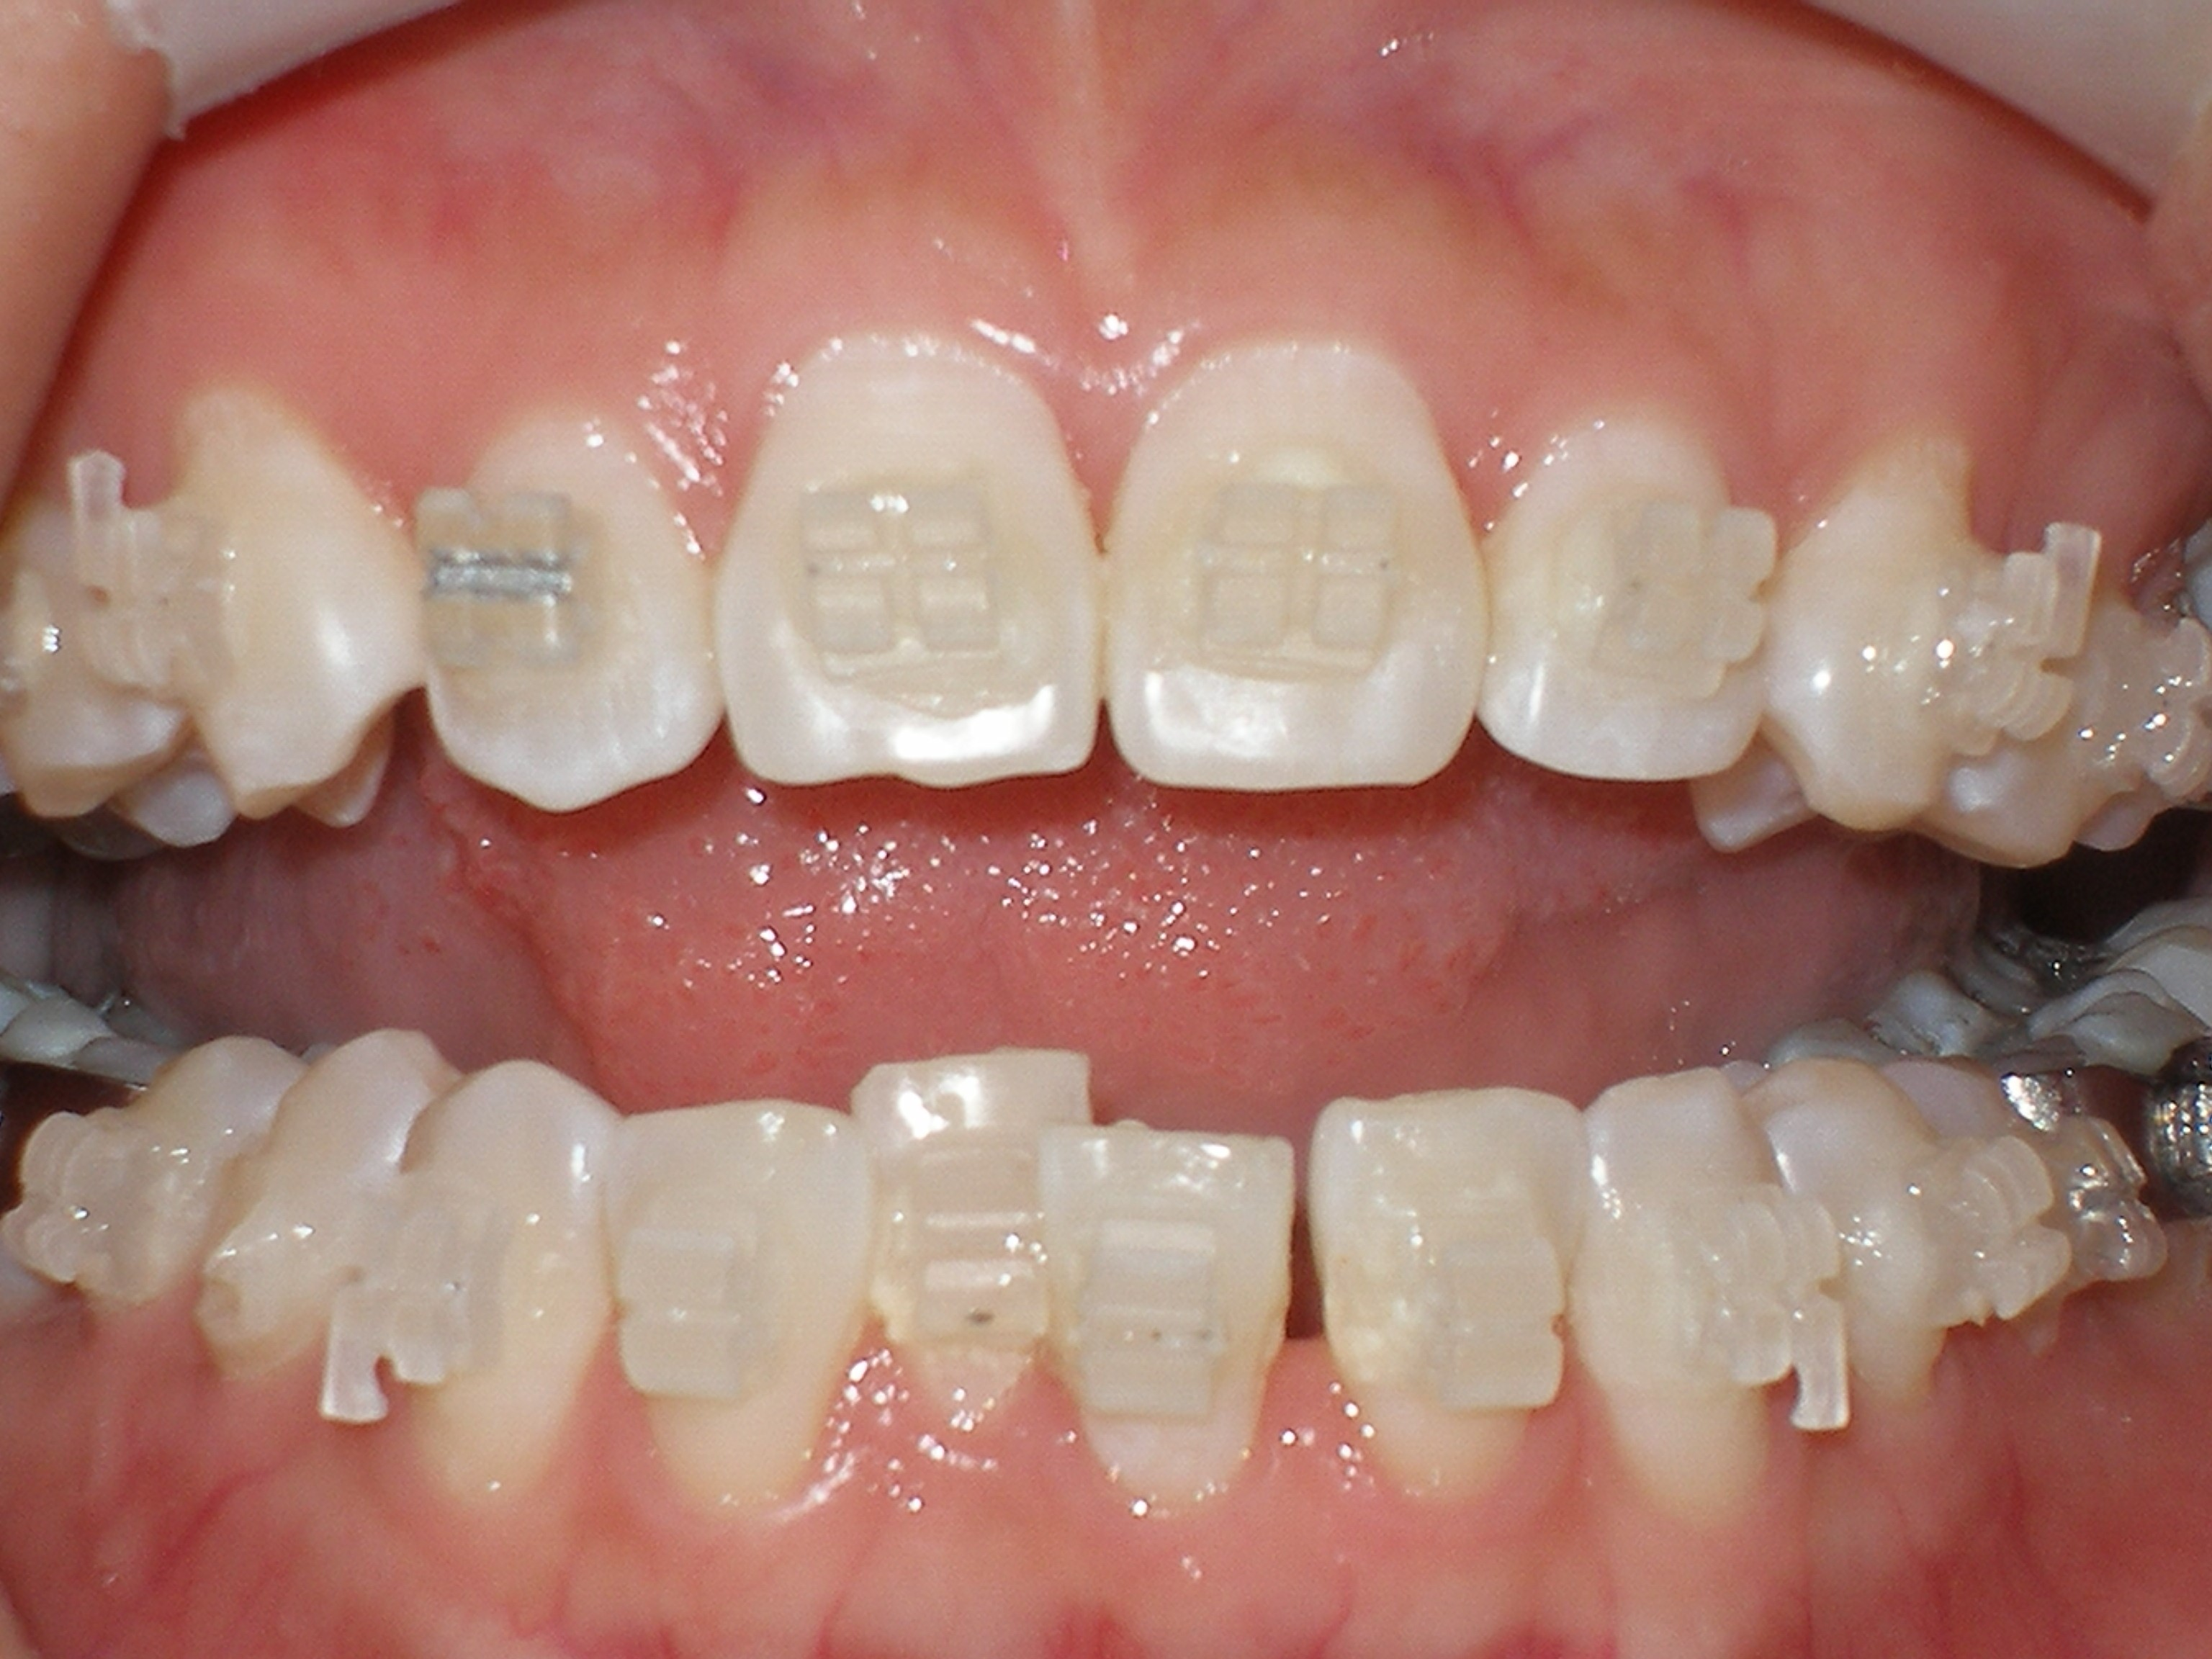 牙齒矯正 — Digital DentalDigital Dental